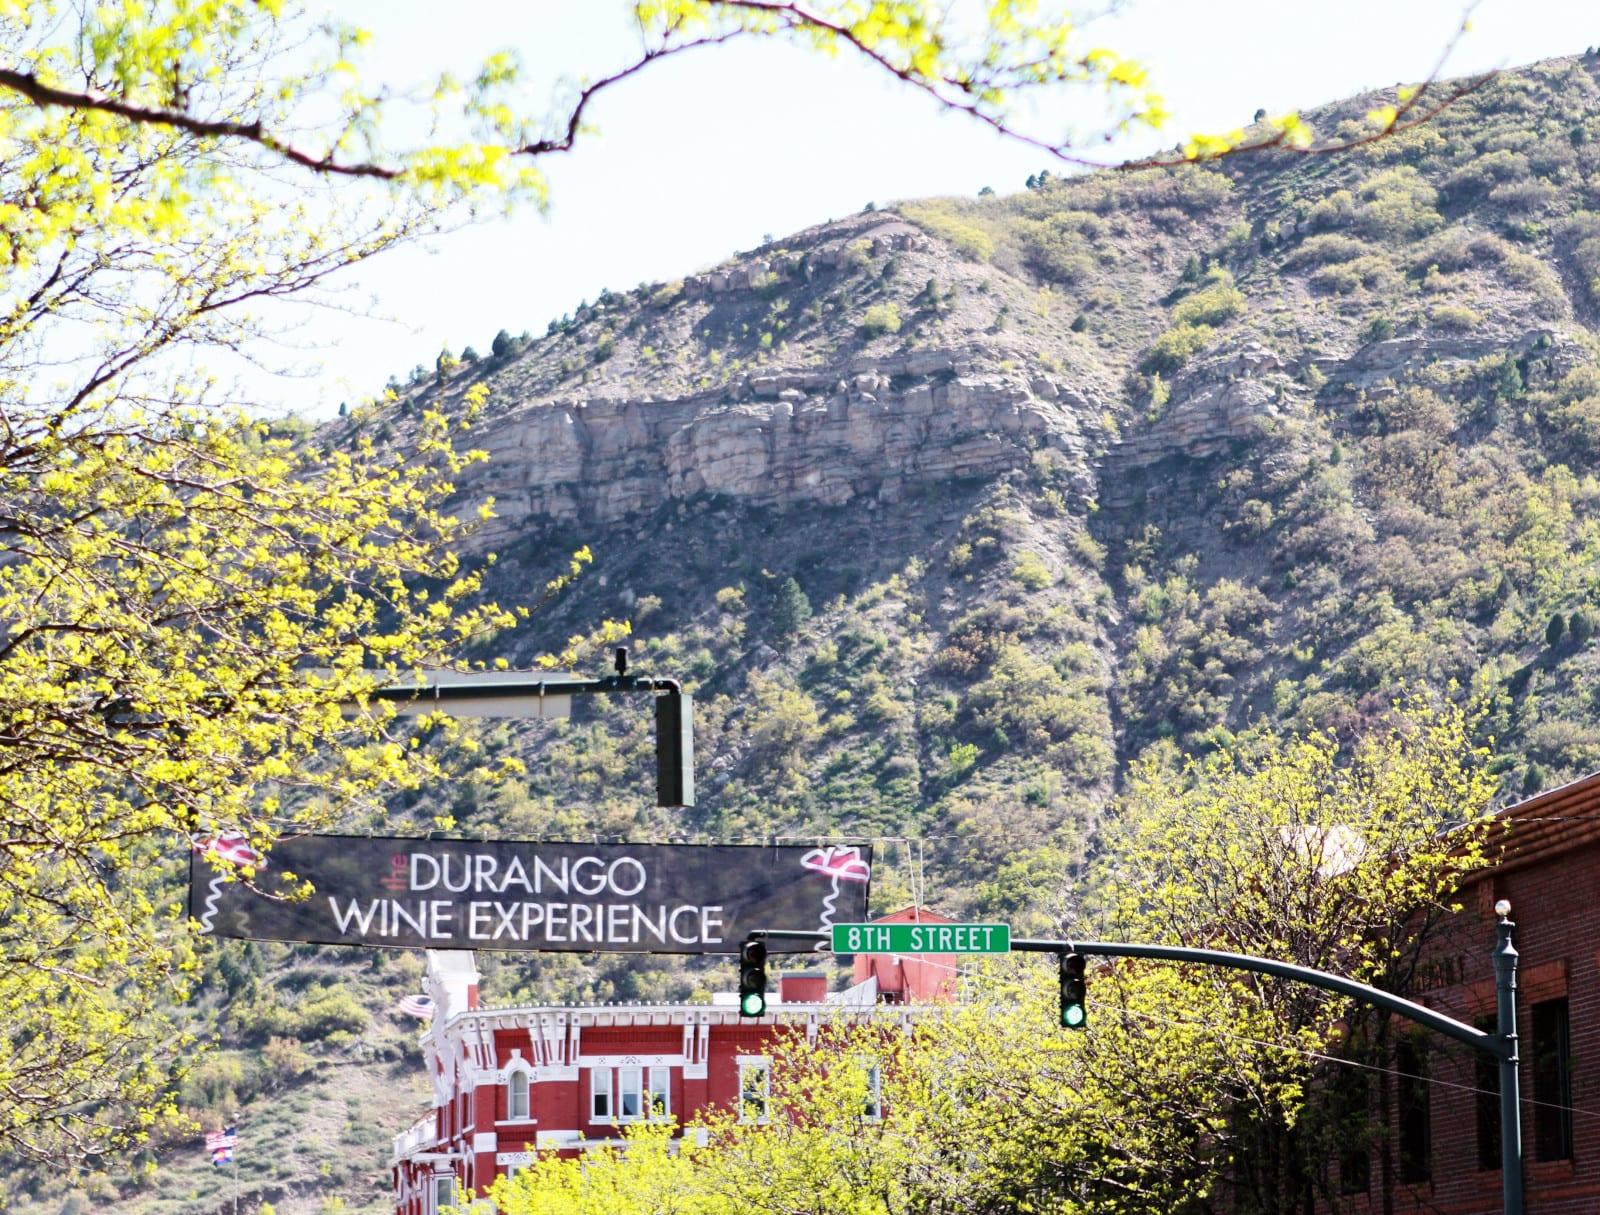 Durango Wine Experience Downtown Banner